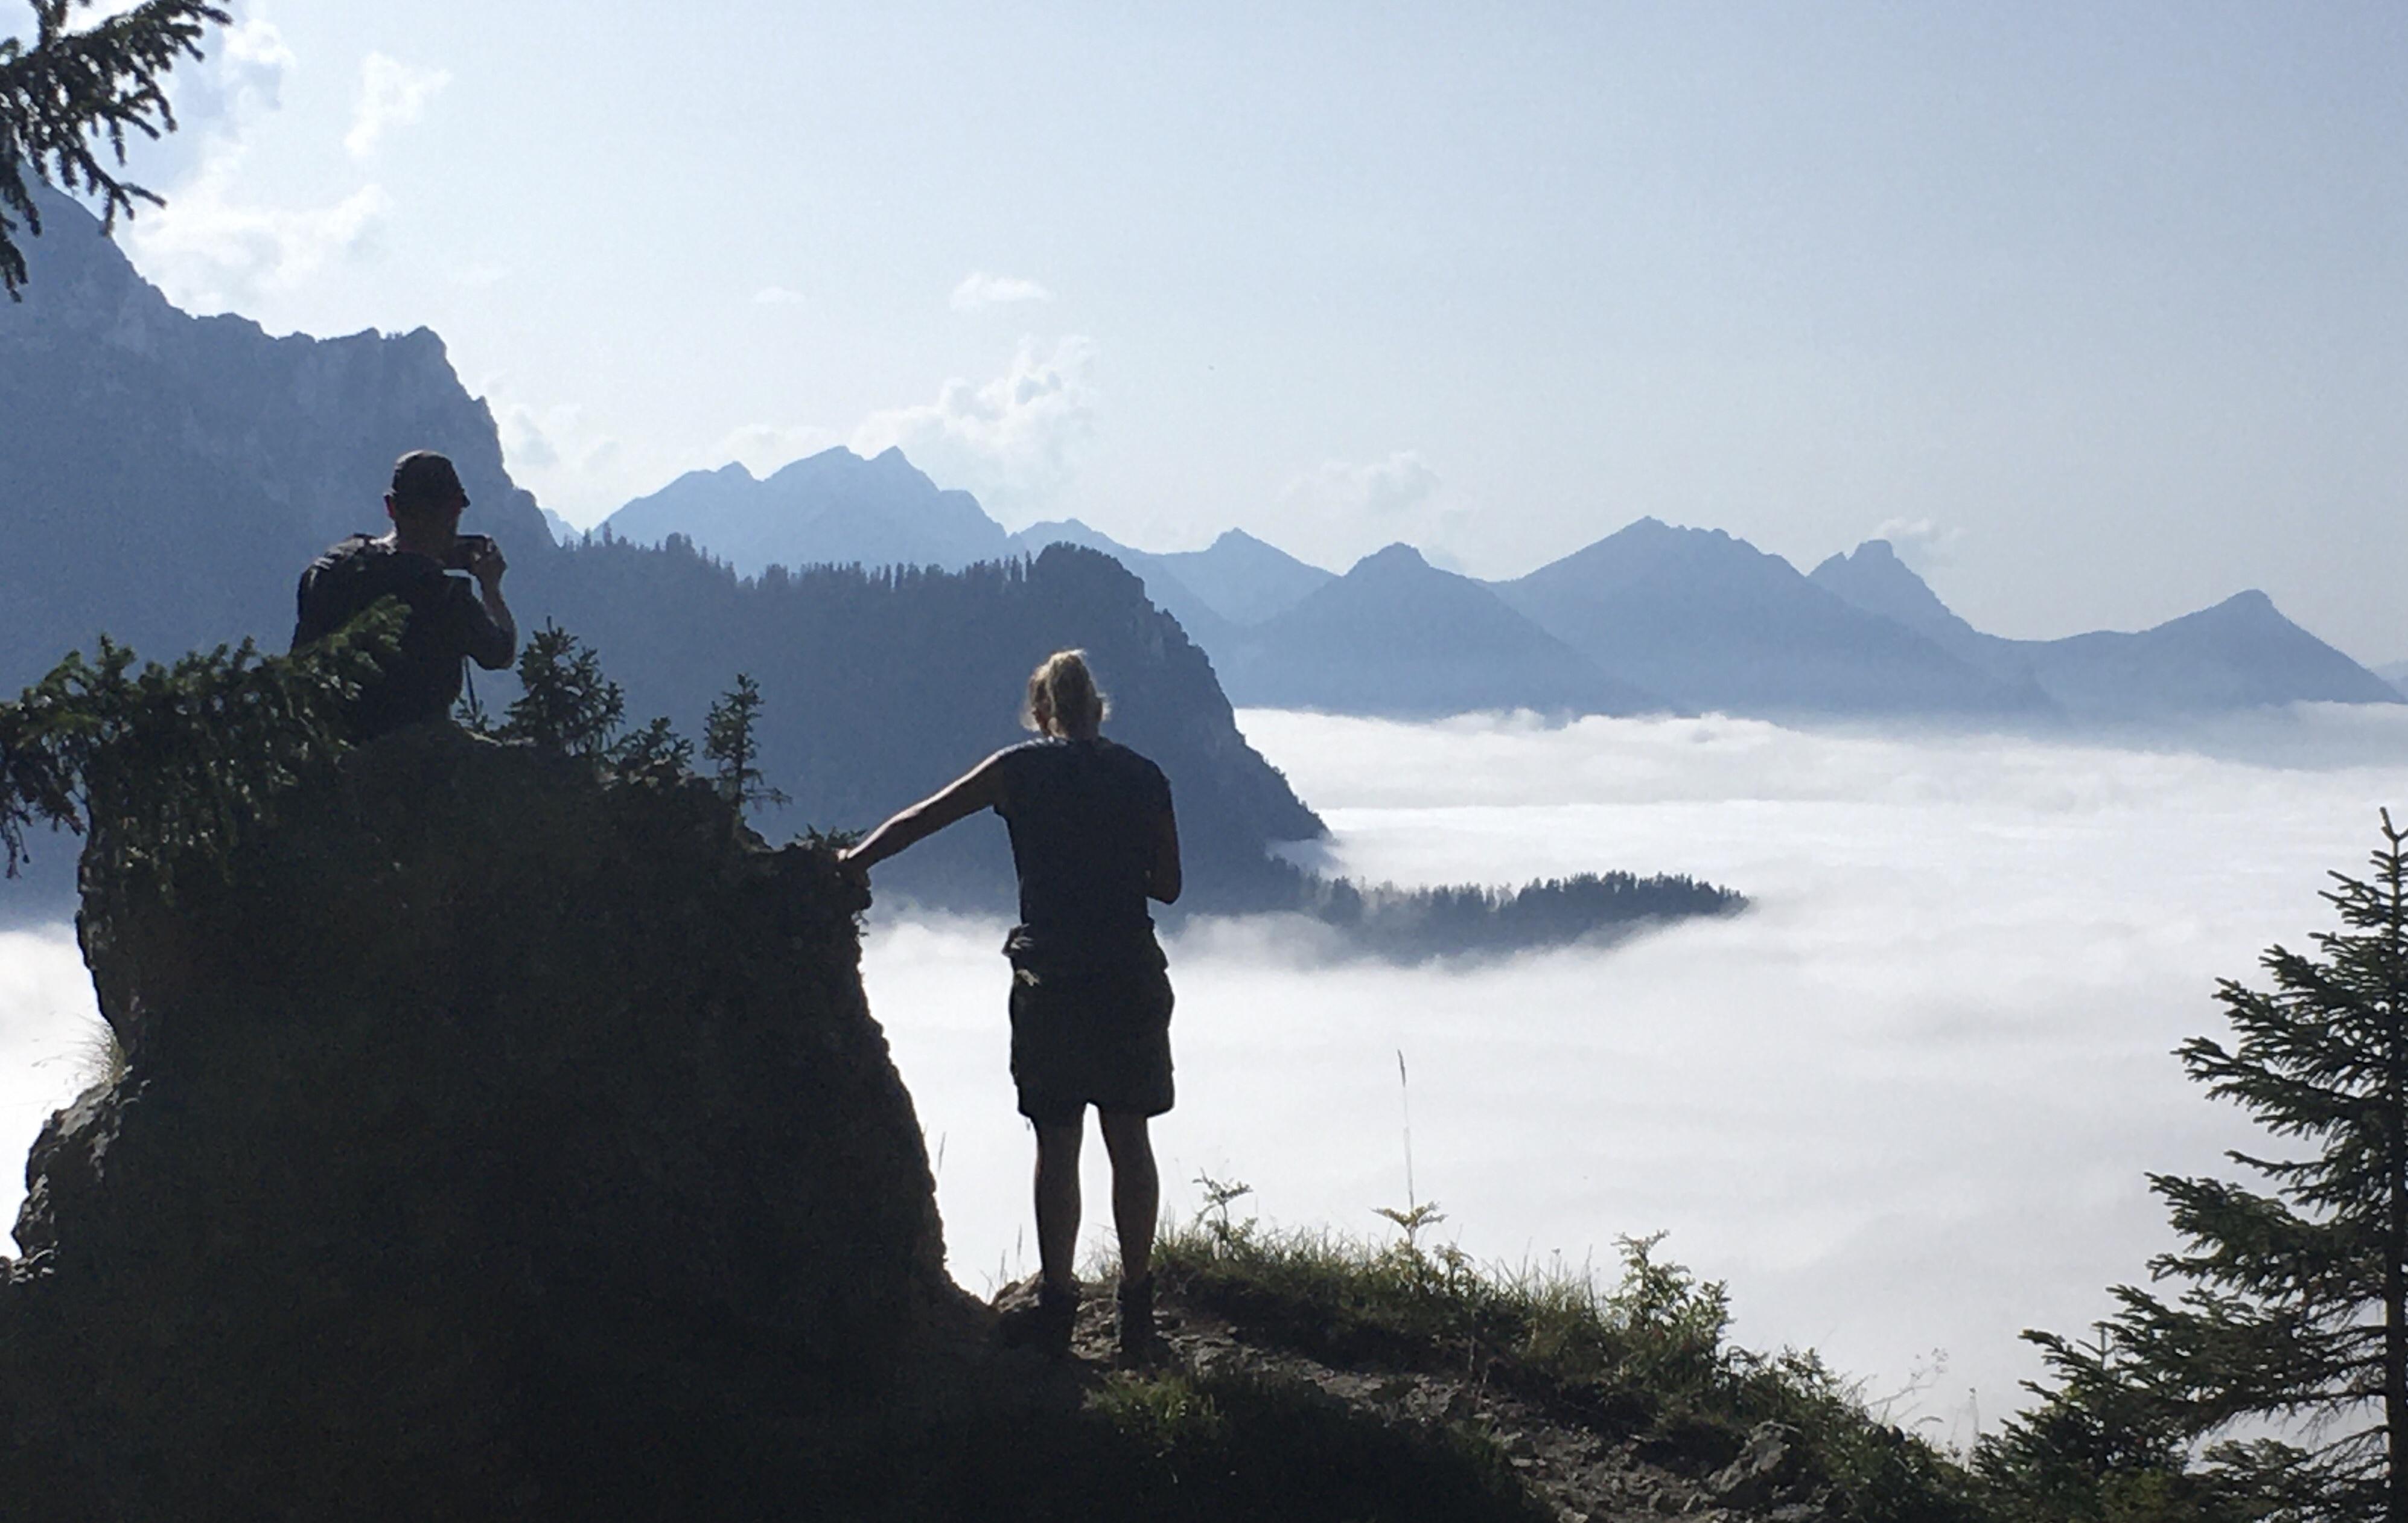 Unsere Wanderer über dem Nebelmeer